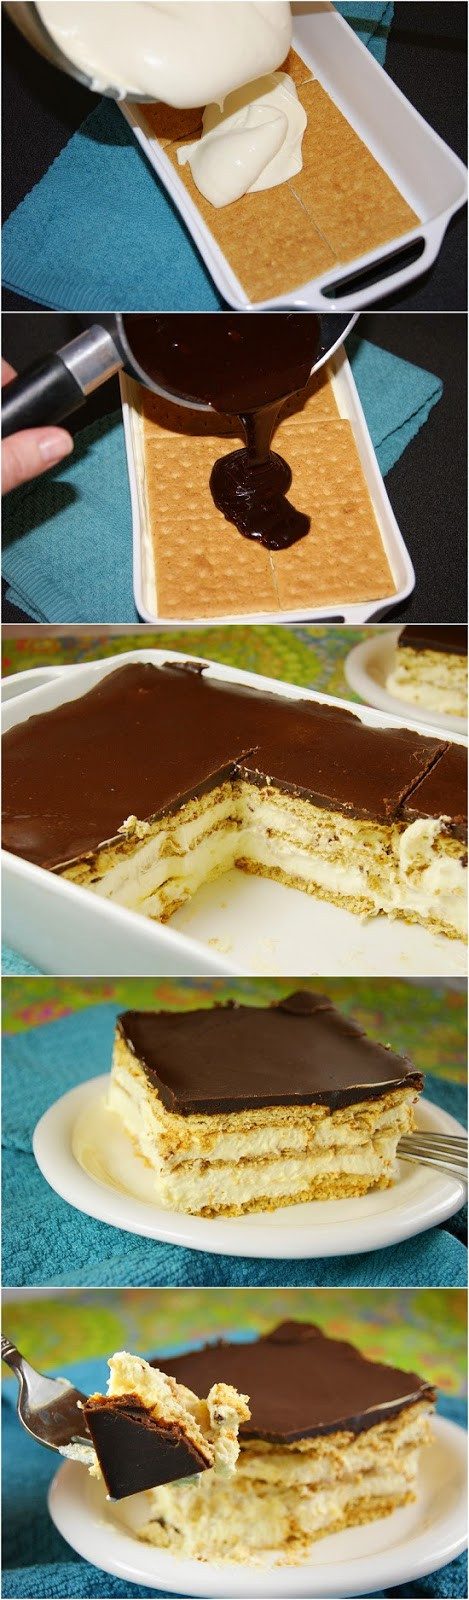 No Bake Eclair Dessert  No Bake Eclair Cake firstyum